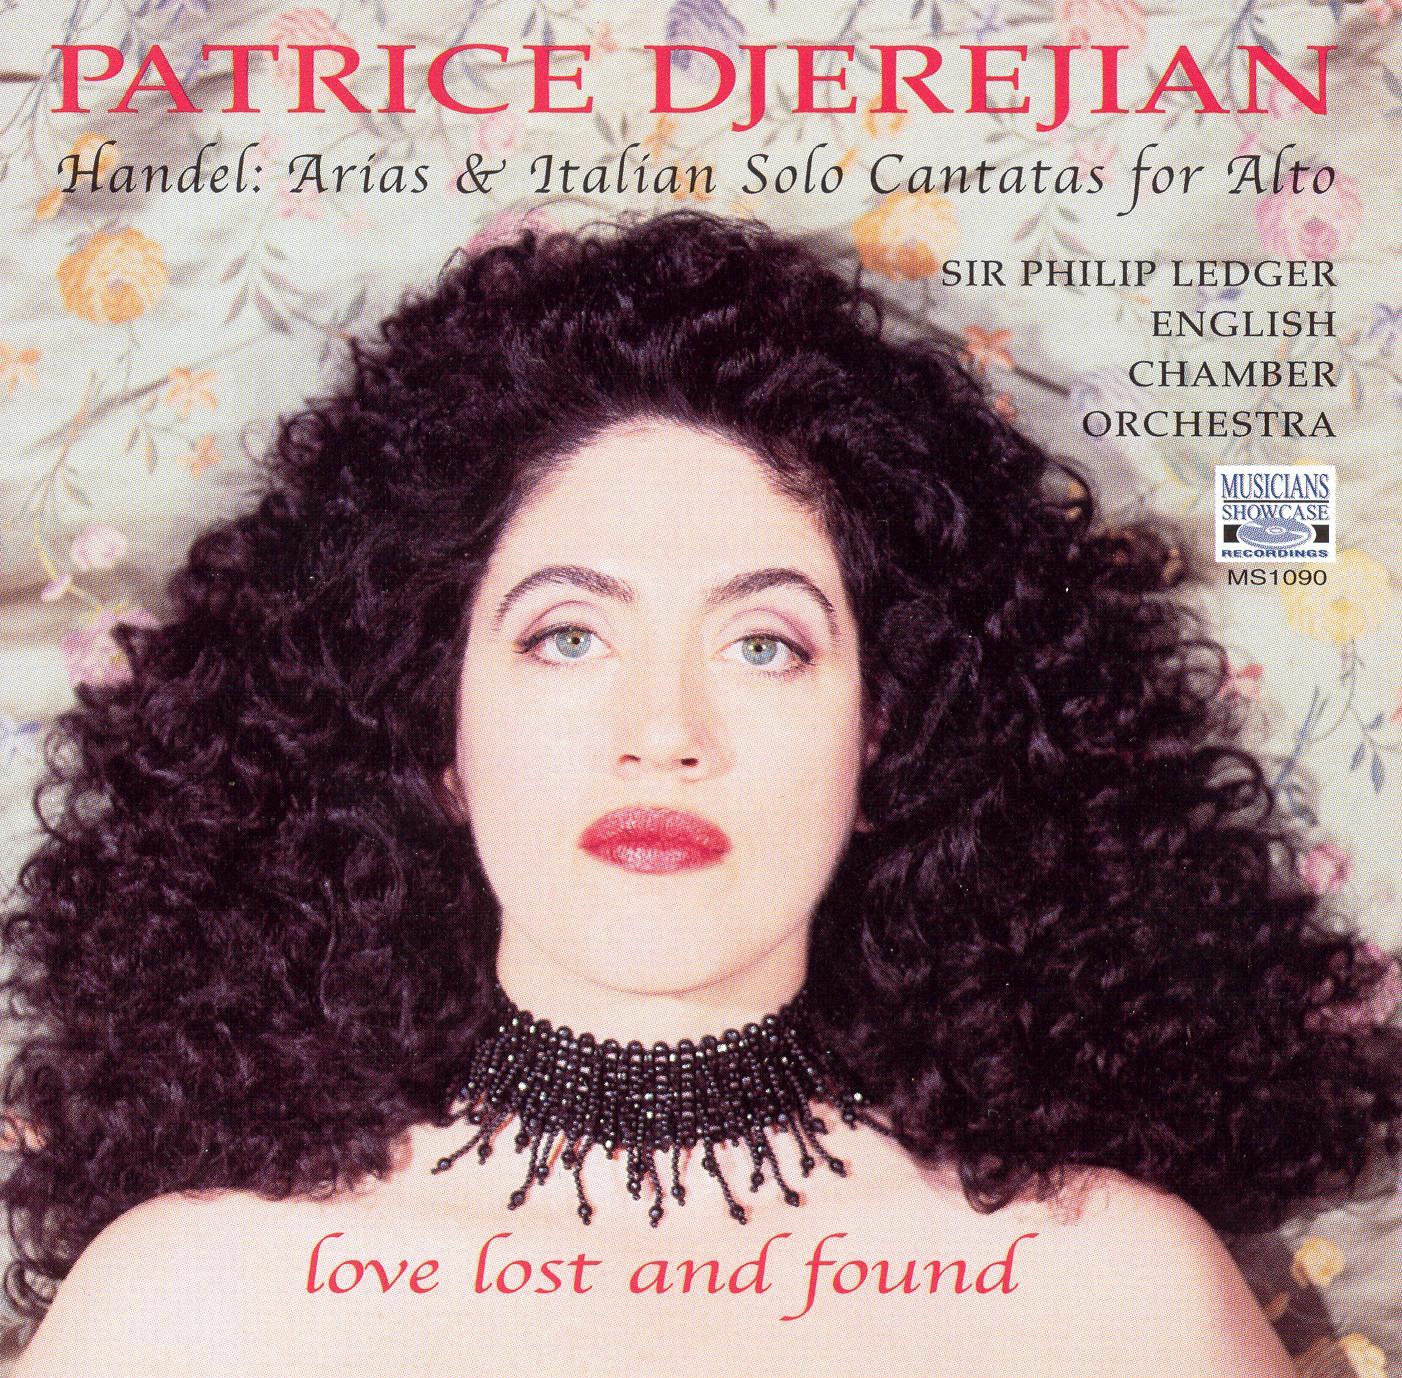 Patrice Djerejian: Love Lost and Found - Handel Arias & Italian Cantatas